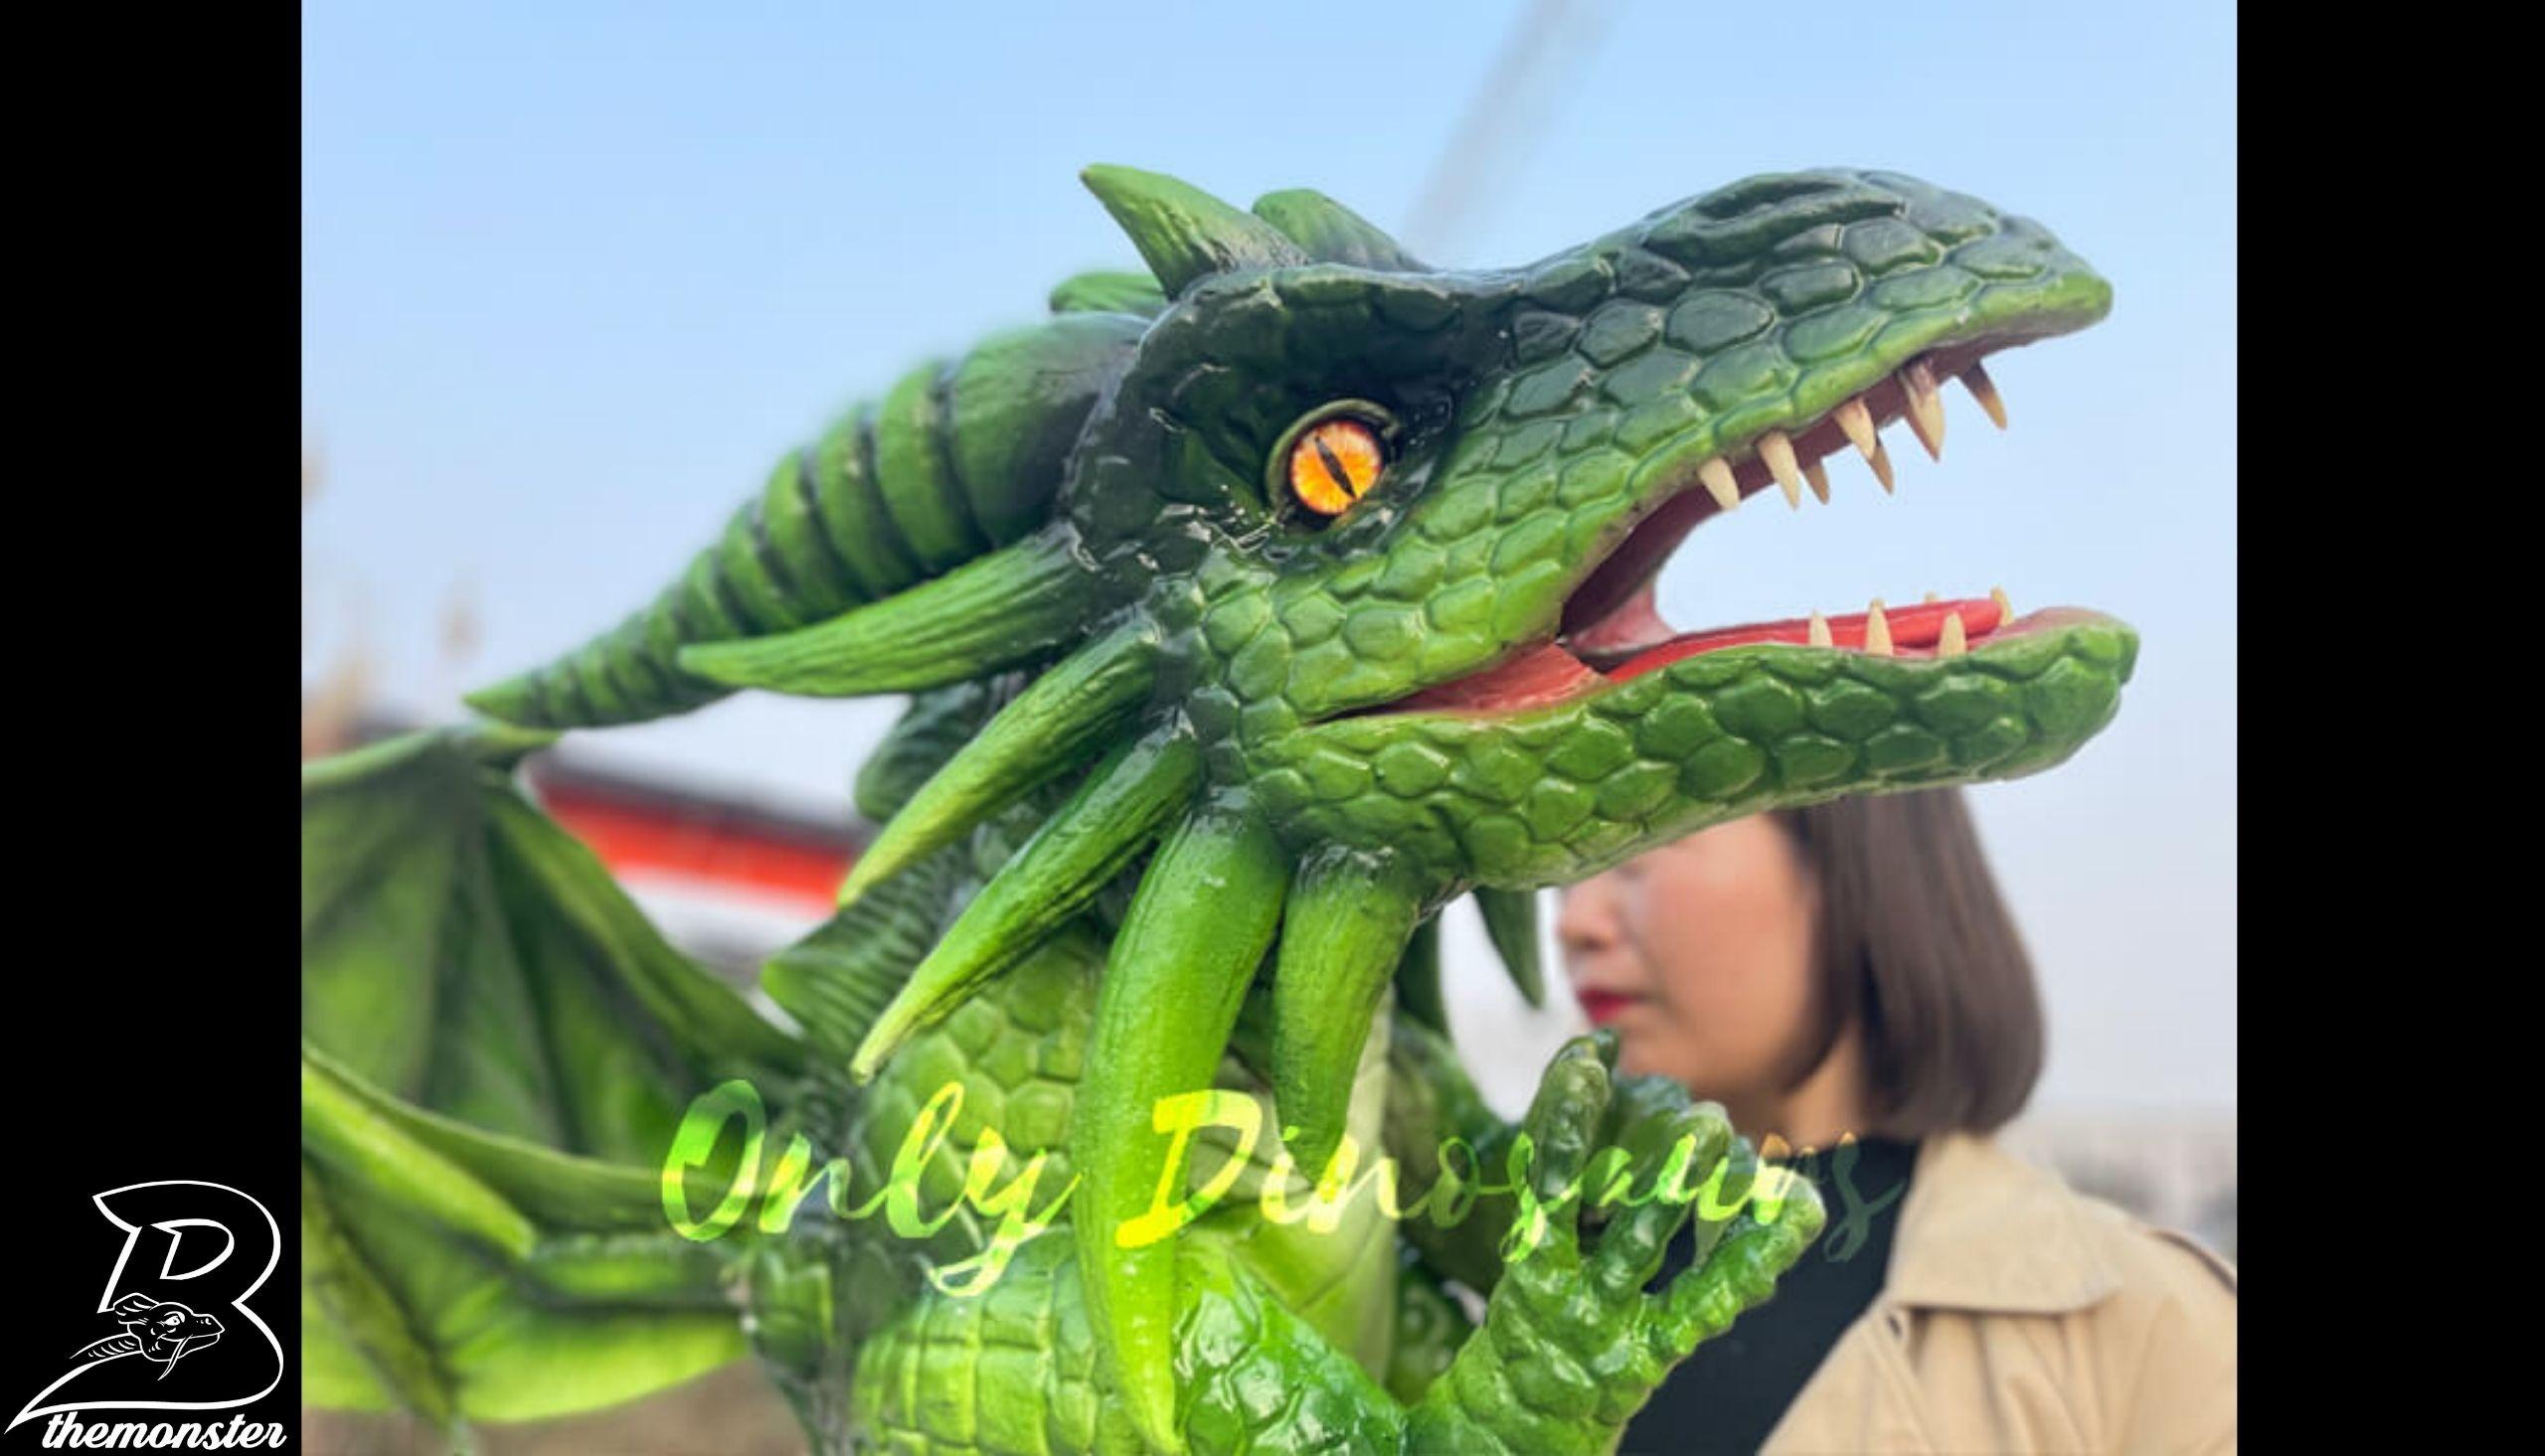 Realistic Flying Green Baby Dragon Puppet in vendita sul Bthemonster.com